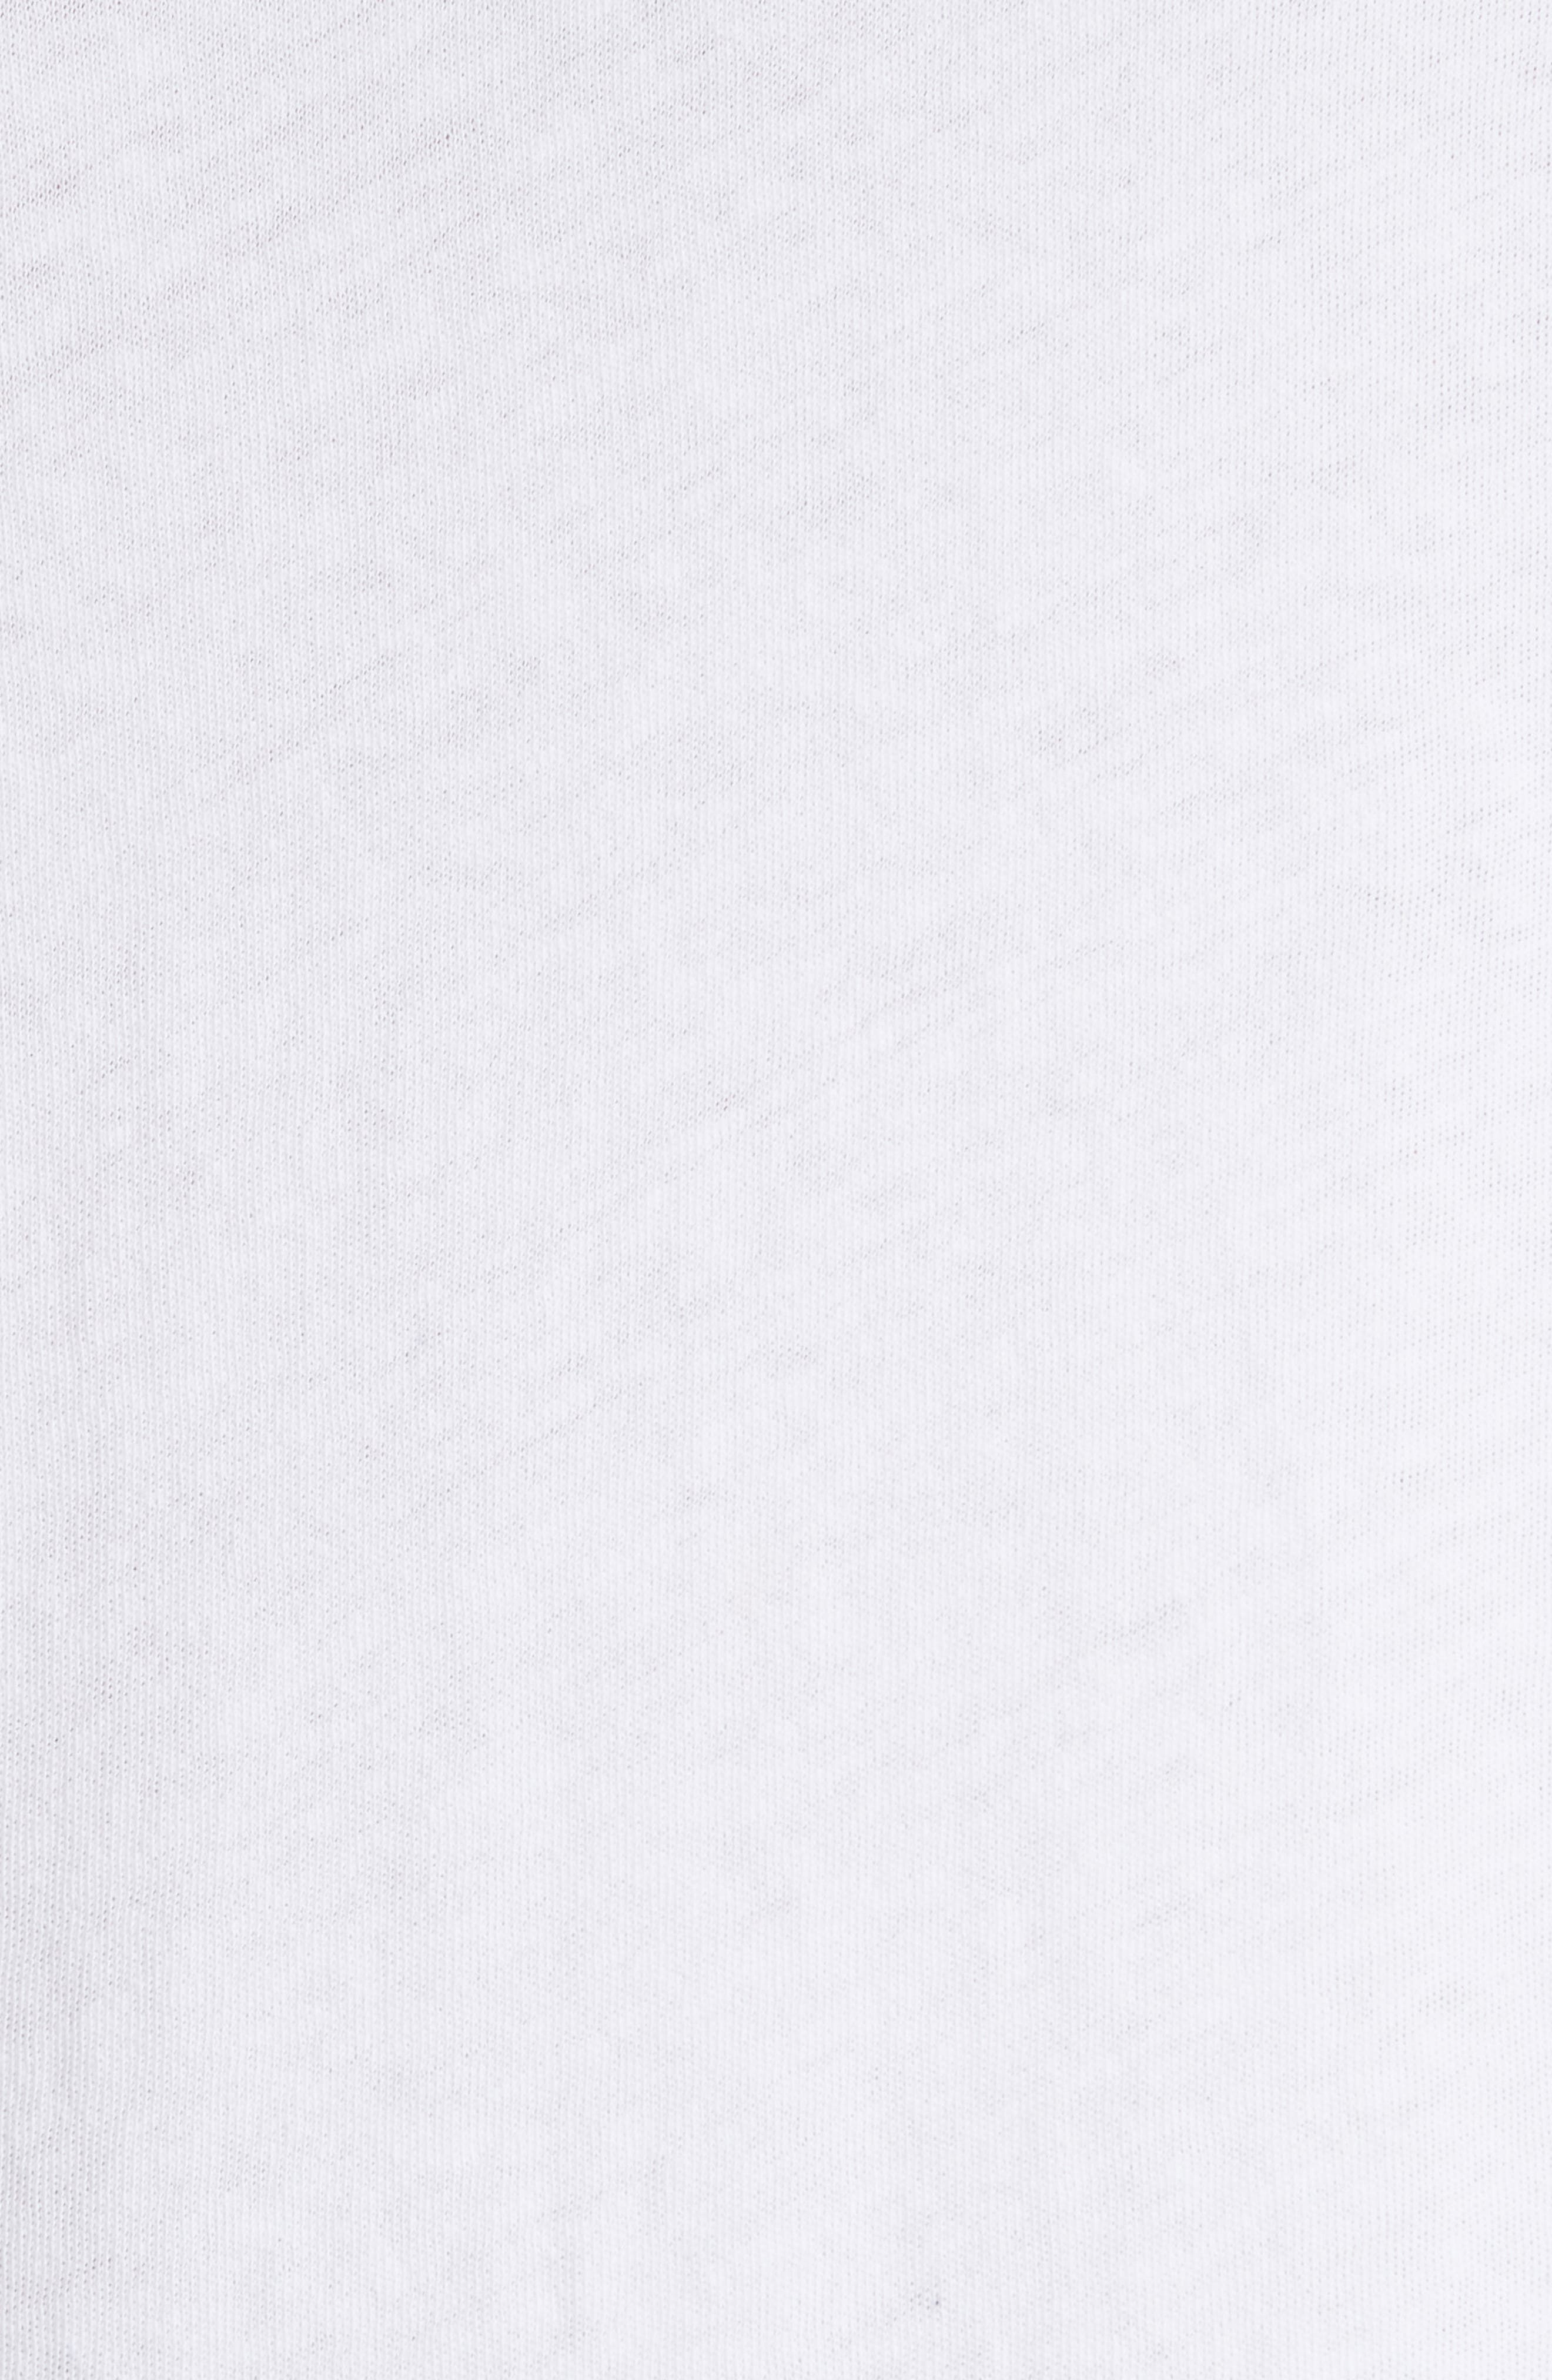 Rupert Long Sleeve T-Shirt,                             Alternate thumbnail 5, color,                             100